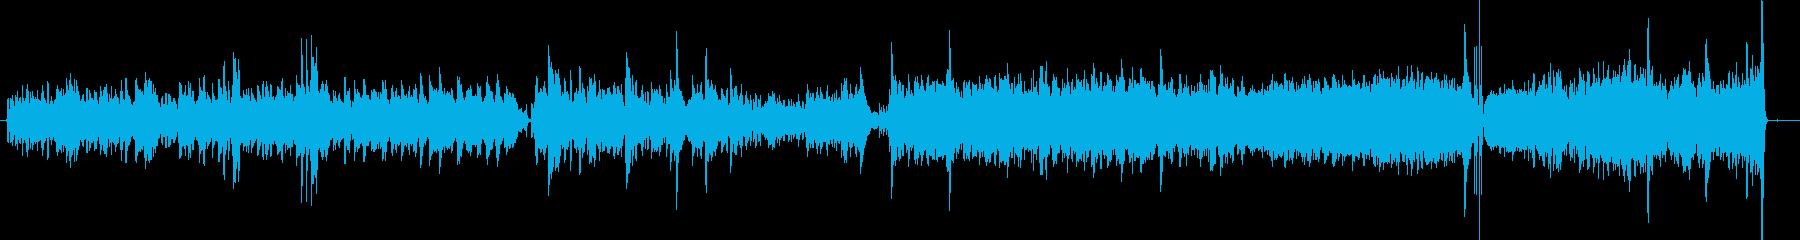 Naku Naruの再生済みの波形